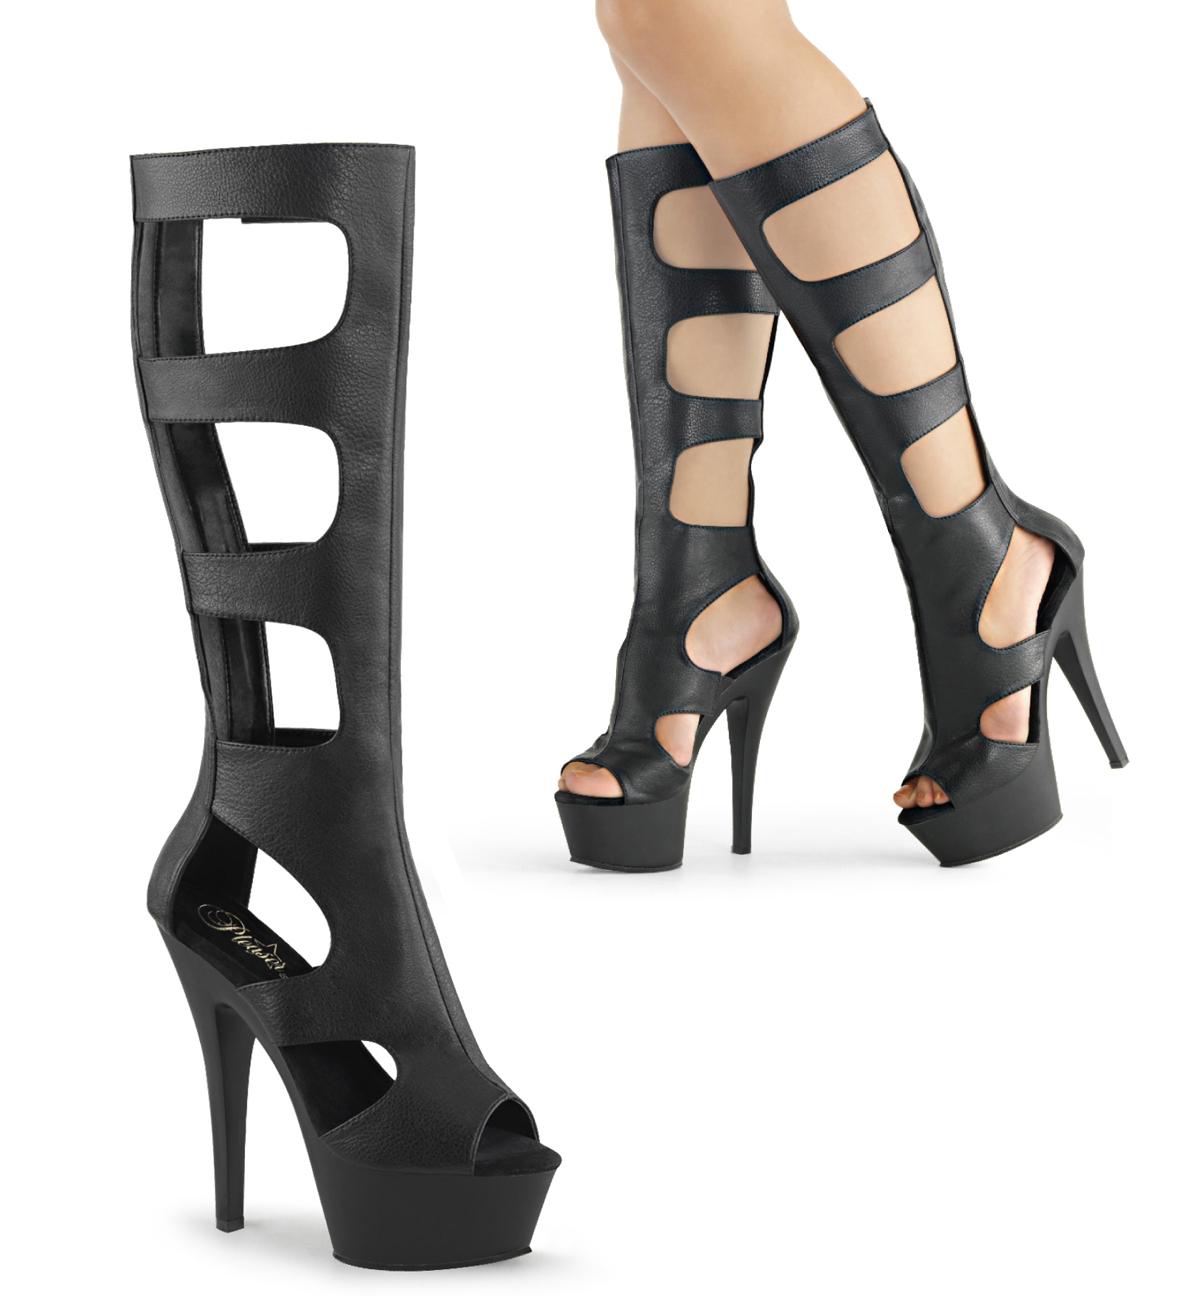 gladiator high heels kiss 200 45 matt schwarz pleaser. Black Bedroom Furniture Sets. Home Design Ideas